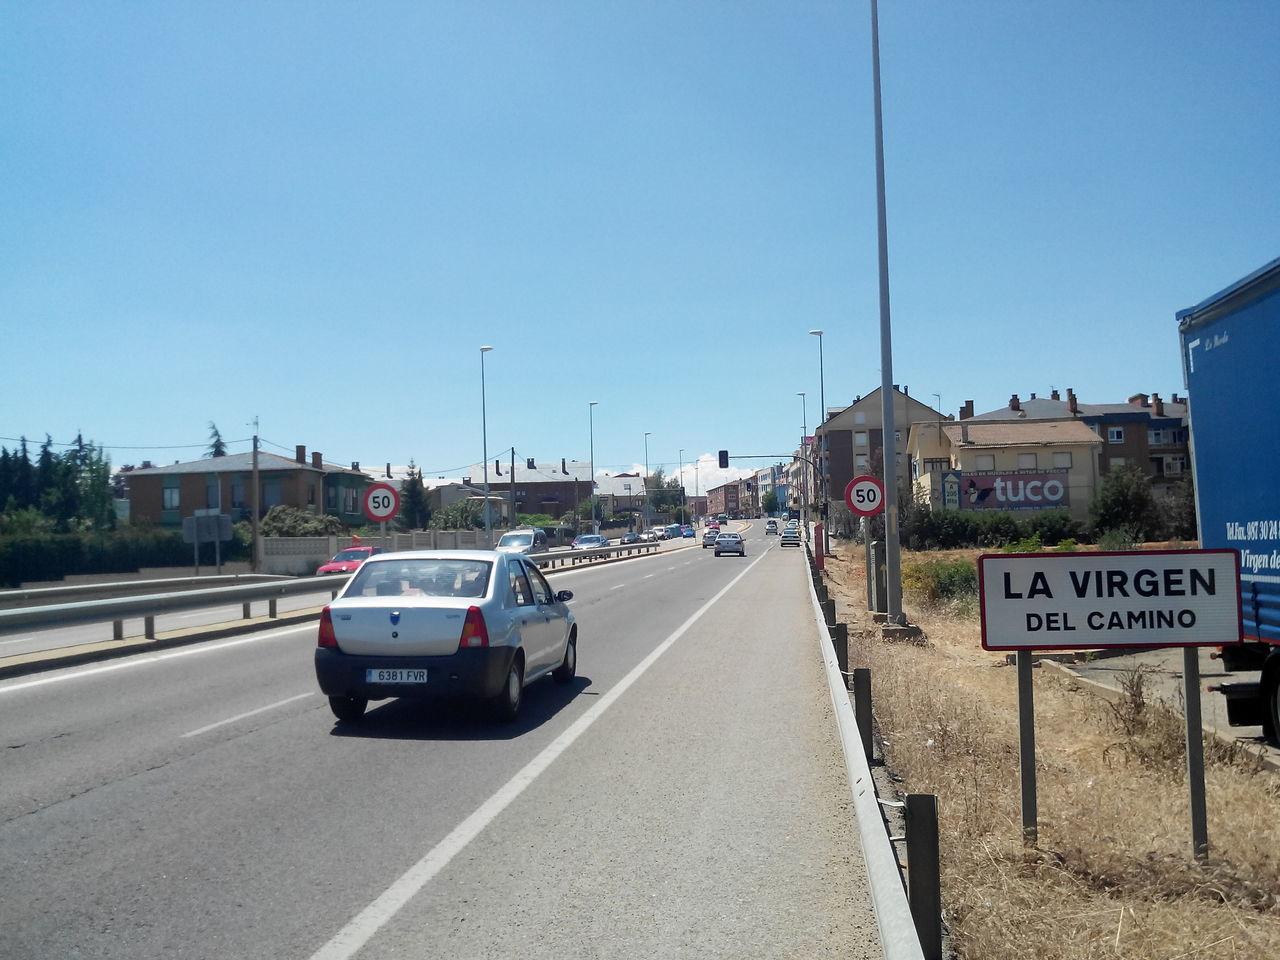 2015  Camino CaminodeSantiago El Camino De Santiago Jakobsweg Pilgern Pilgerschaft Pilgrimage Road Straße Weg Wege Und Strassen